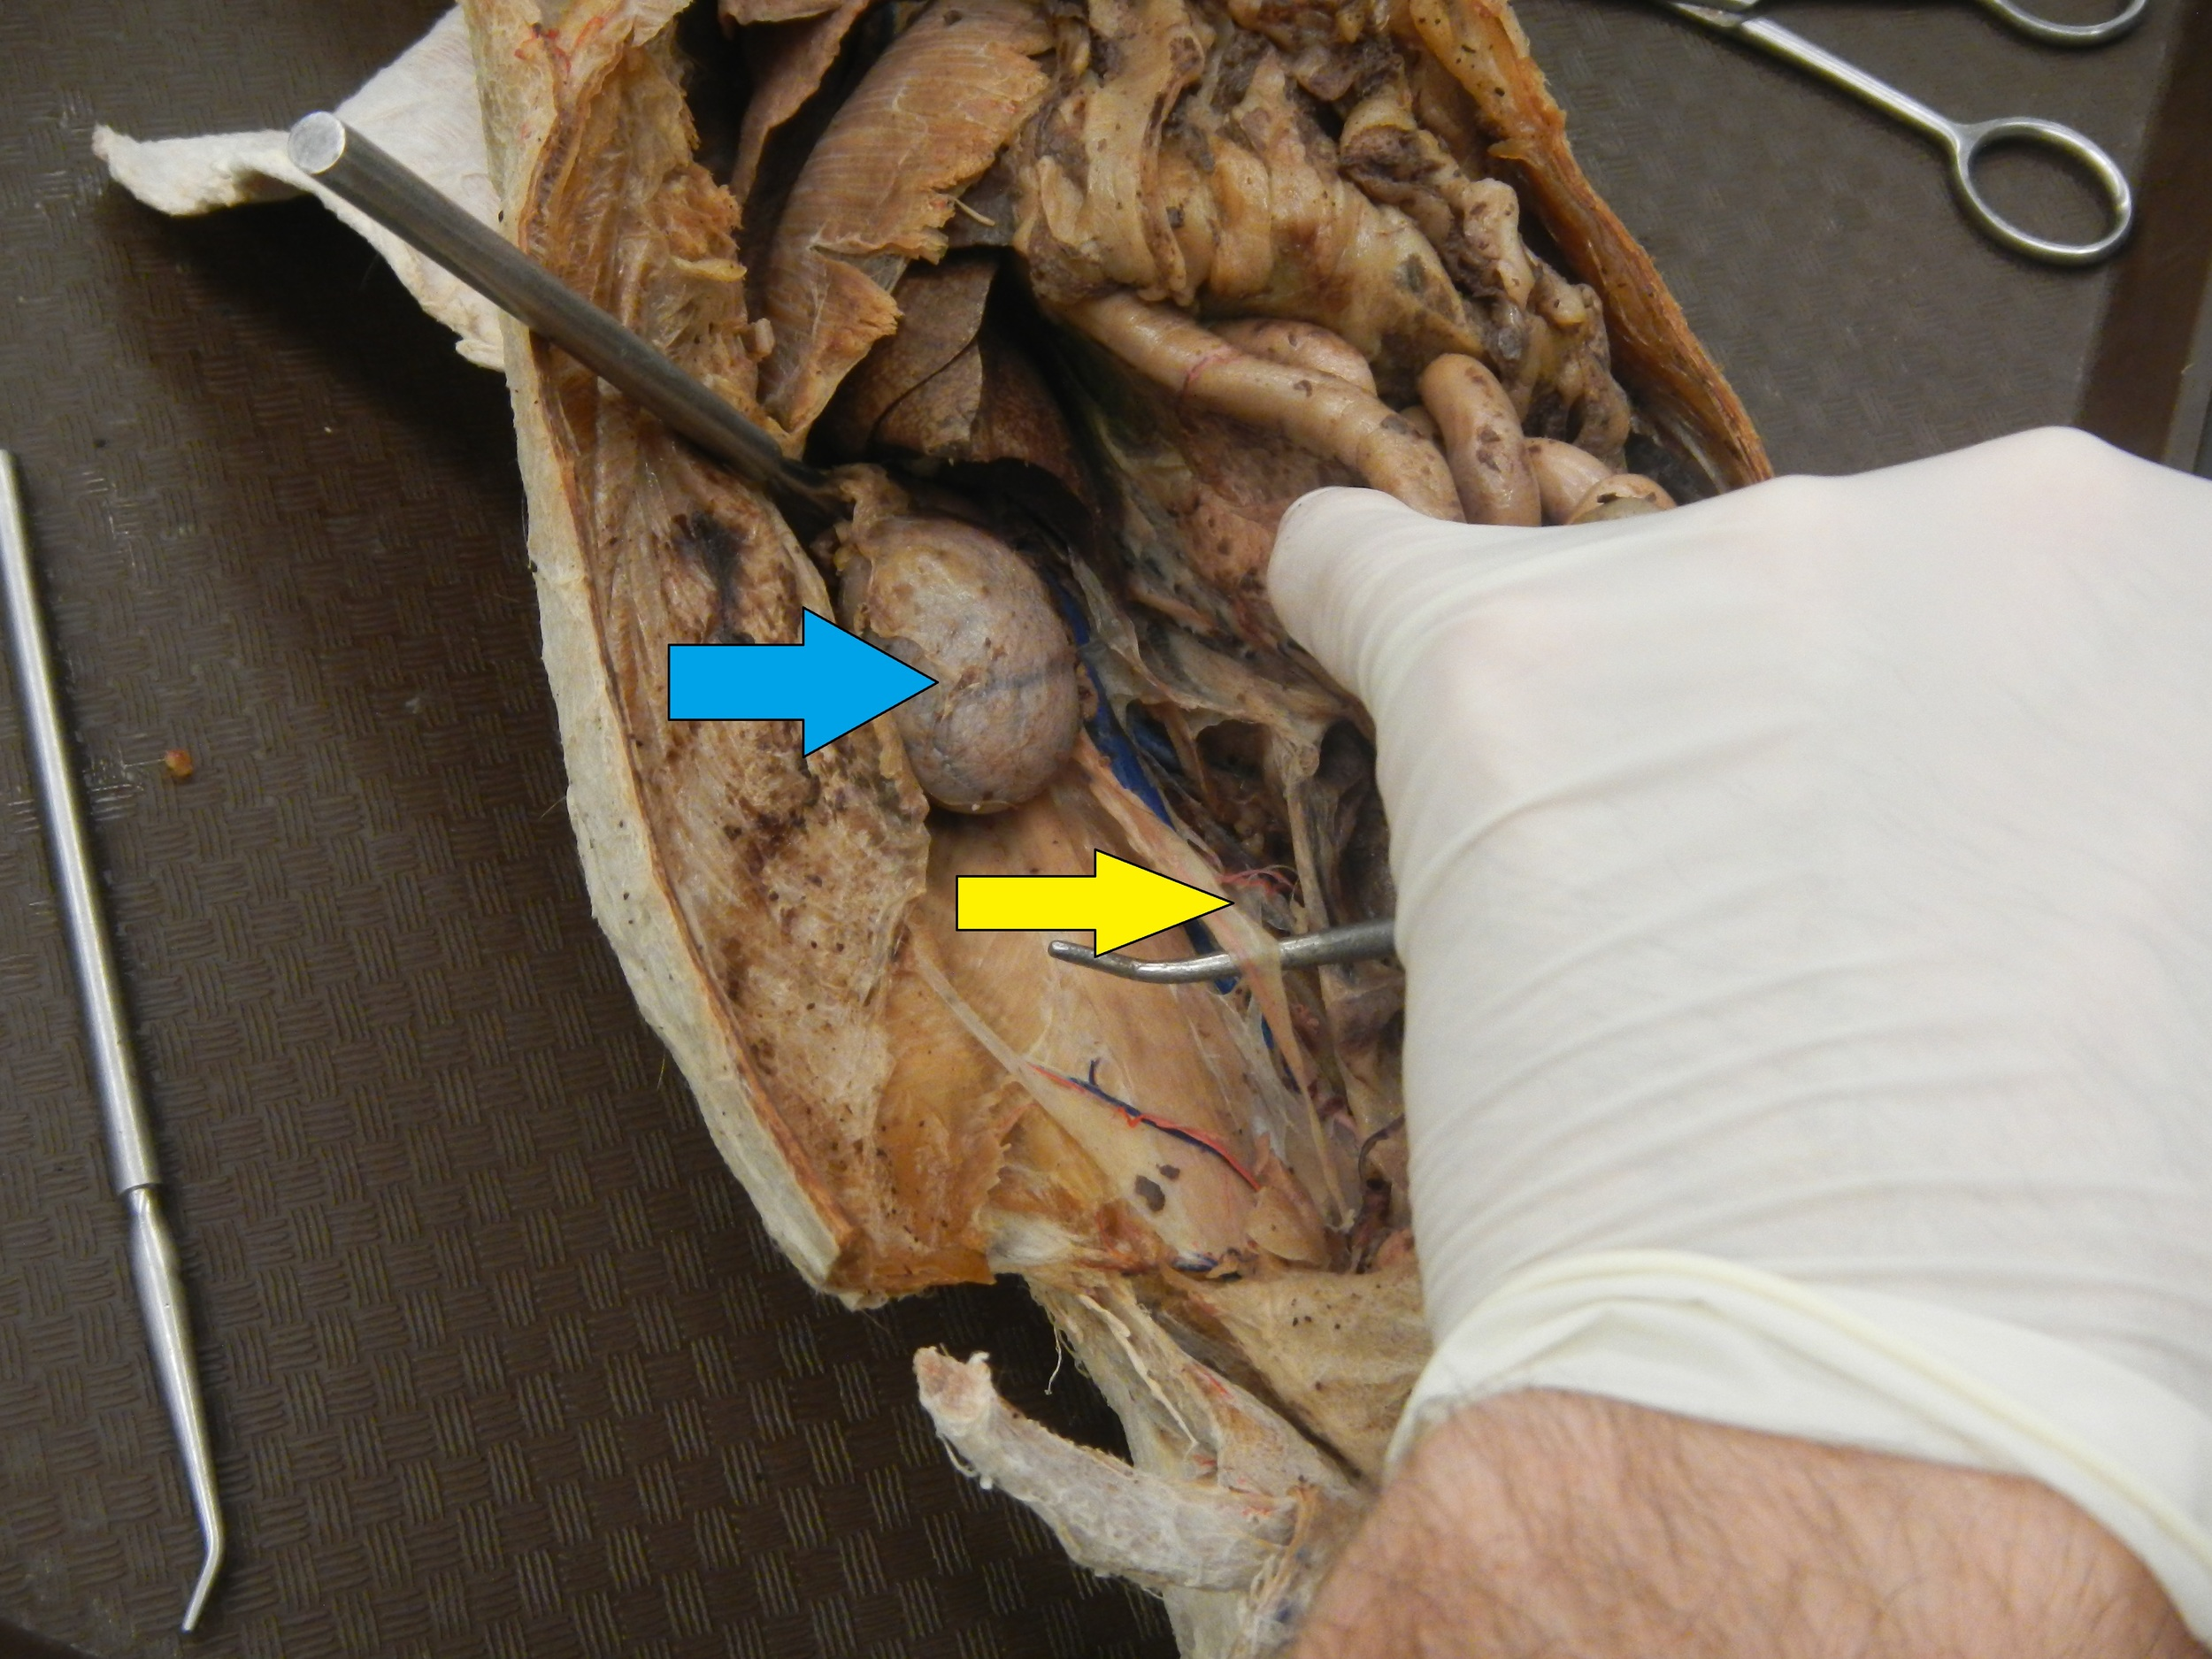 Blue - Right Kidney  Yellow - Ureter